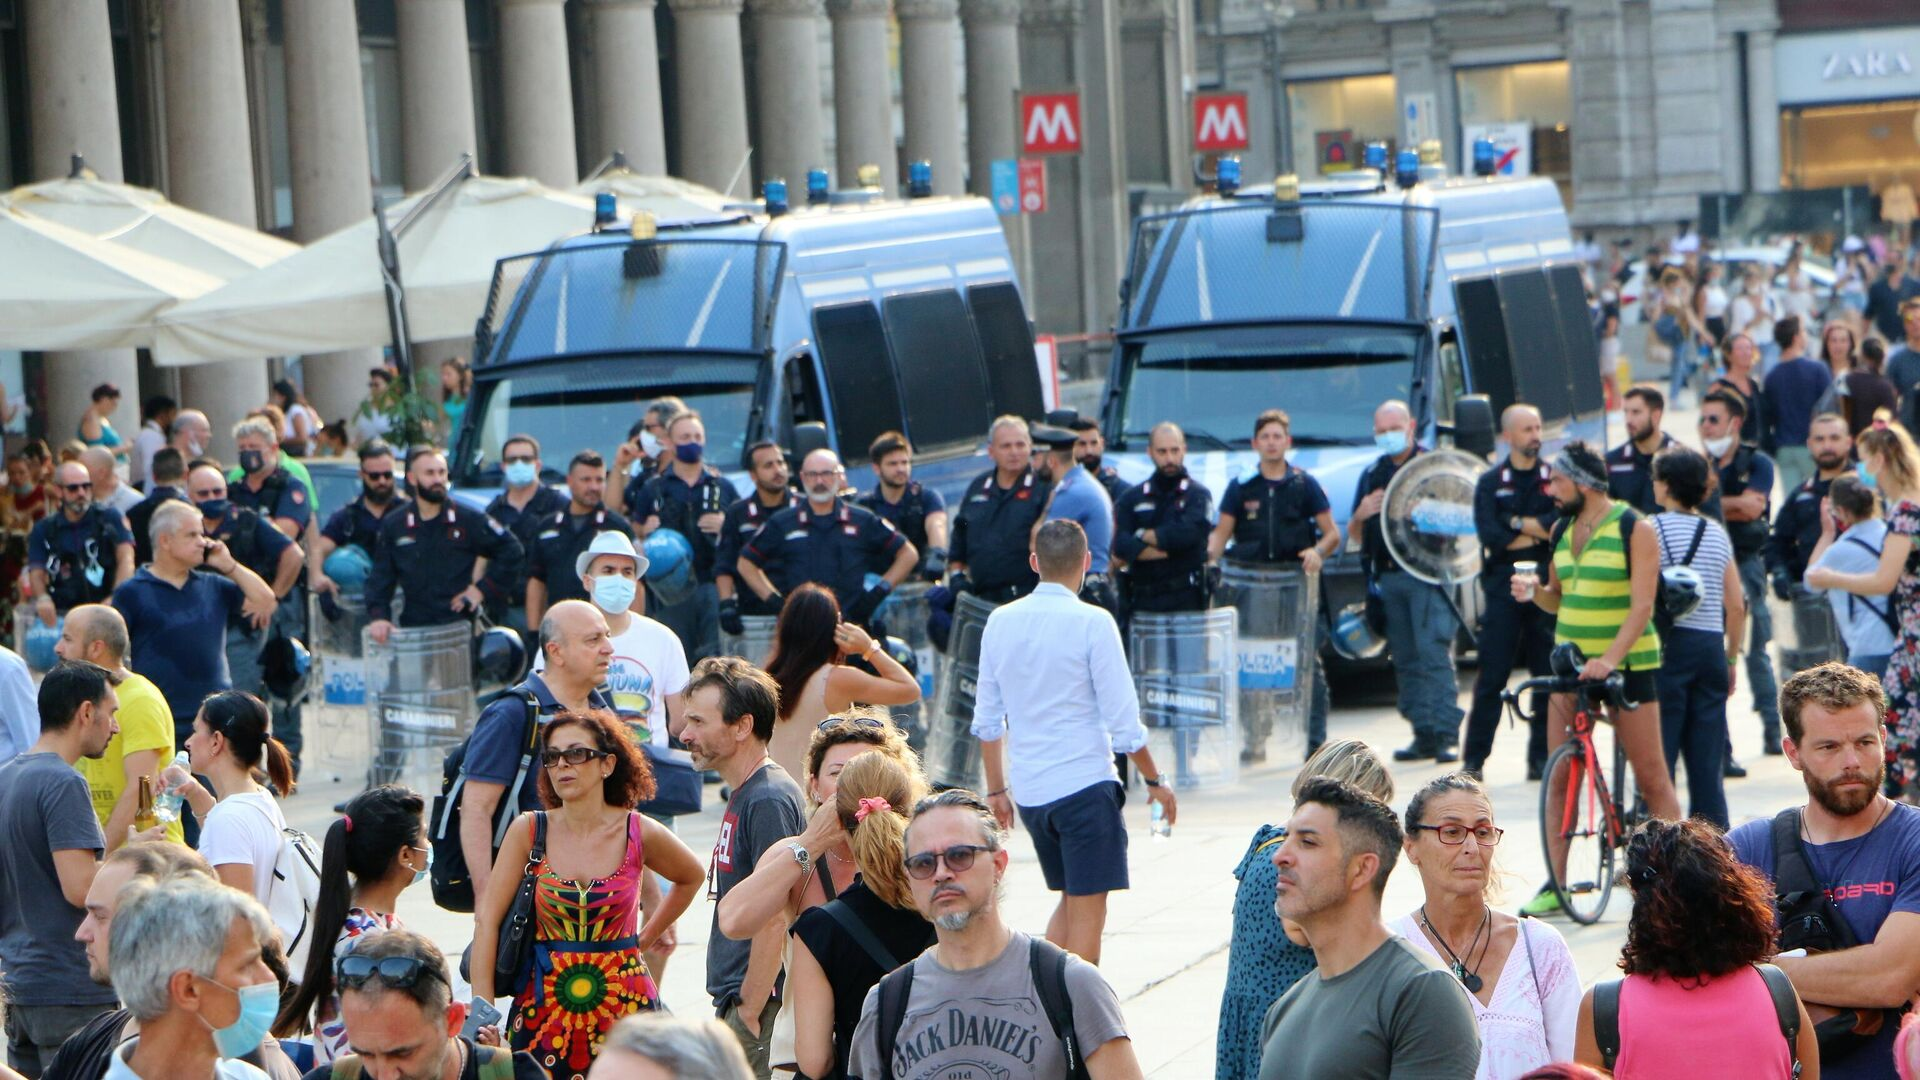 Manifestazione No green pass a Milano - Sputnik Italia, 1920, 31.07.2021